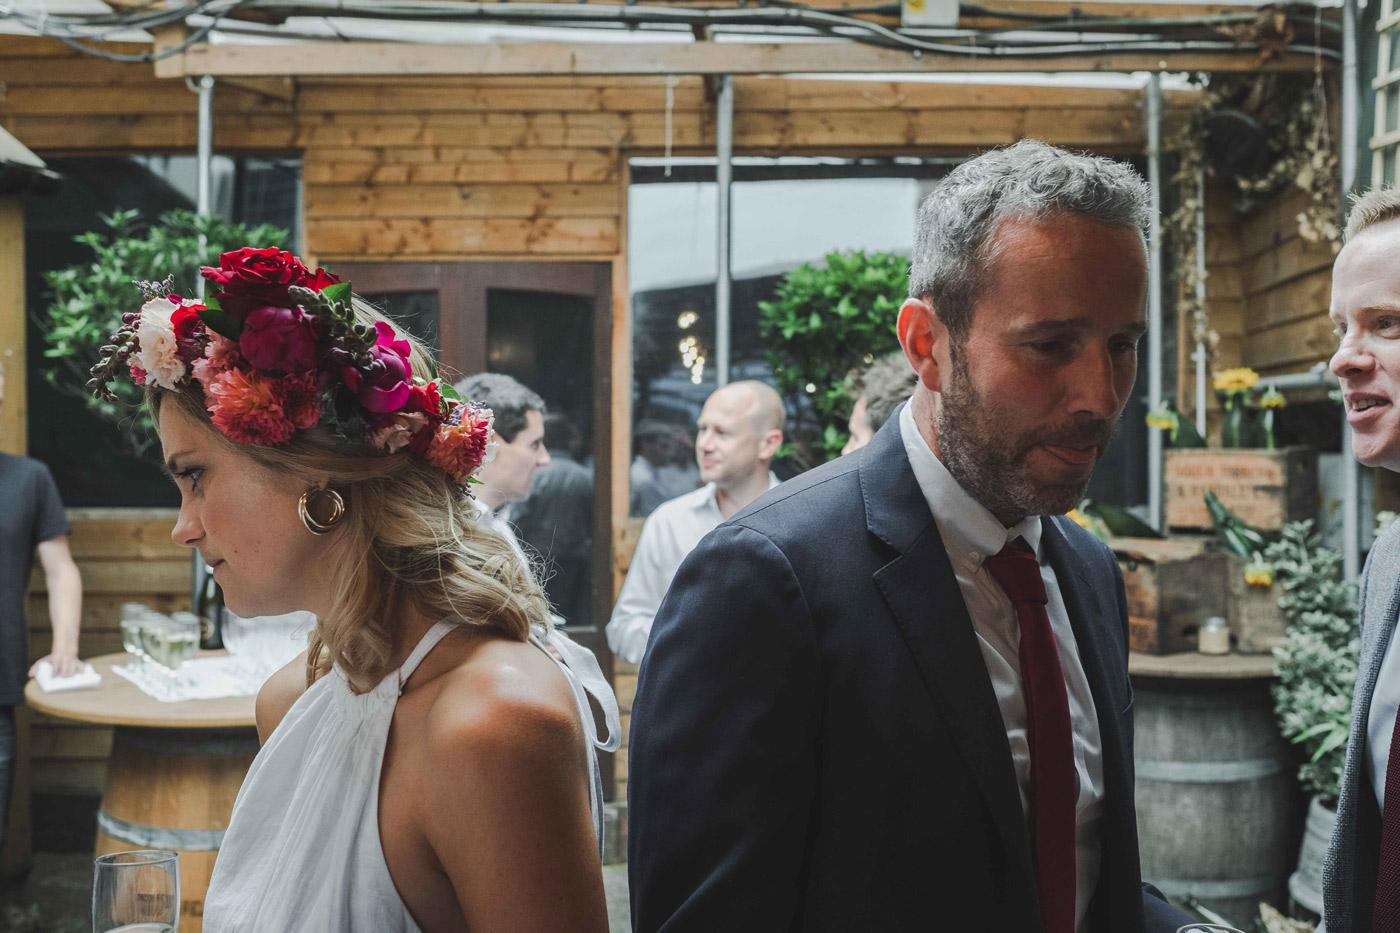 hackney wedding reception at London fields brewery